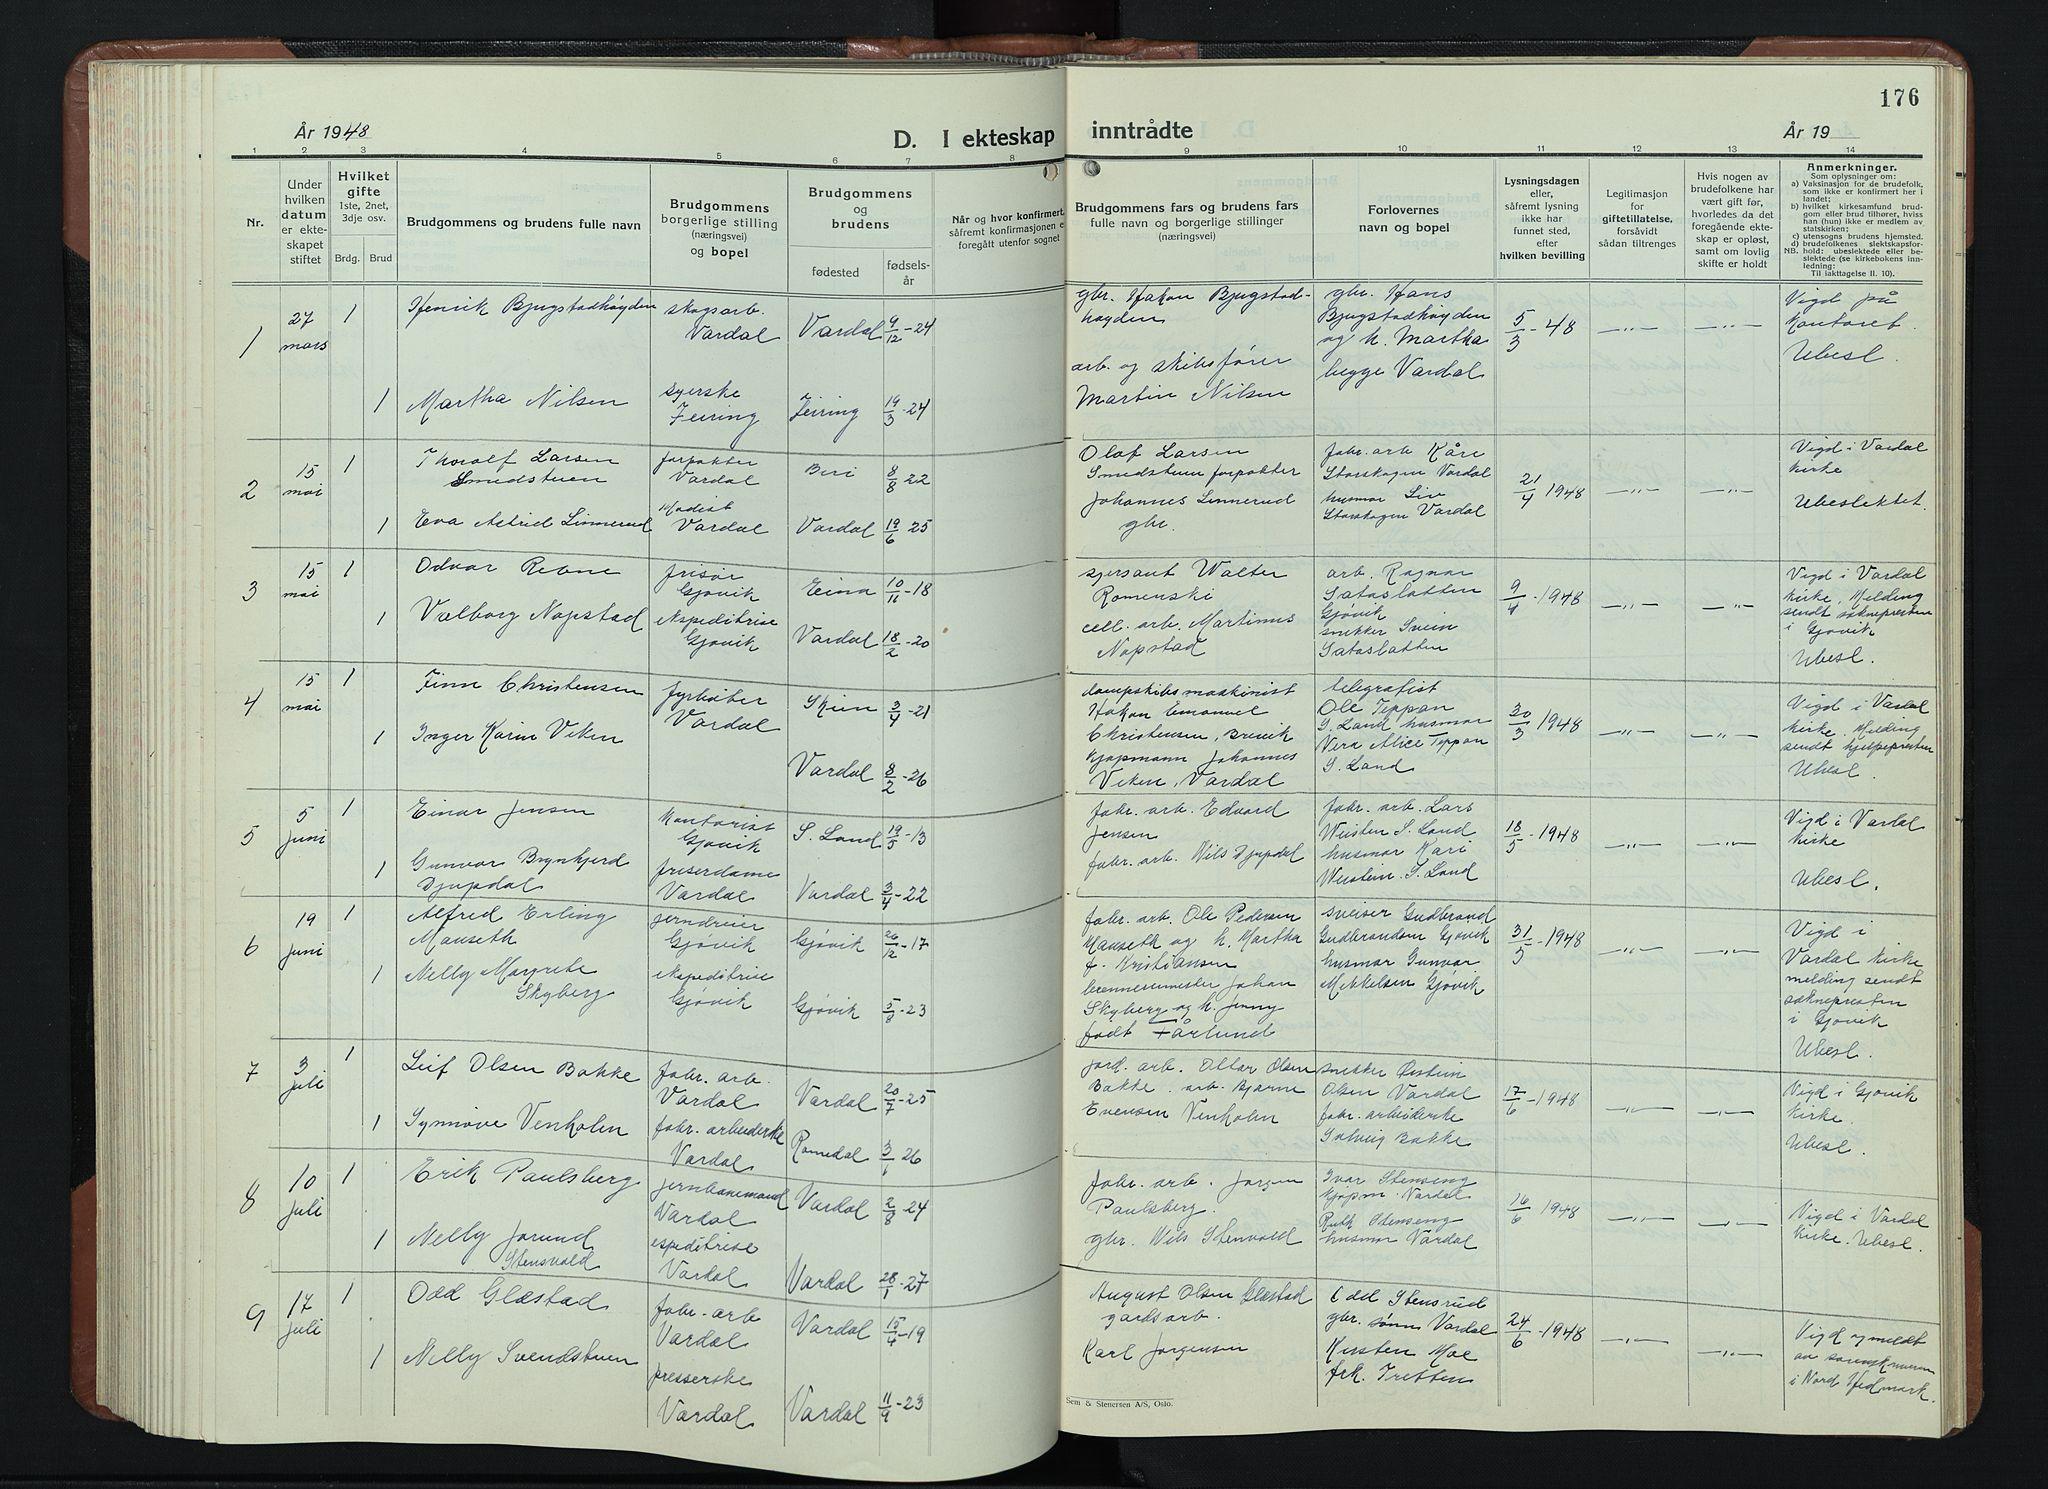 SAH, Vardal prestekontor, H/Ha/Hab/L0018: Klokkerbok nr. 18, 1931-1951, s. 176